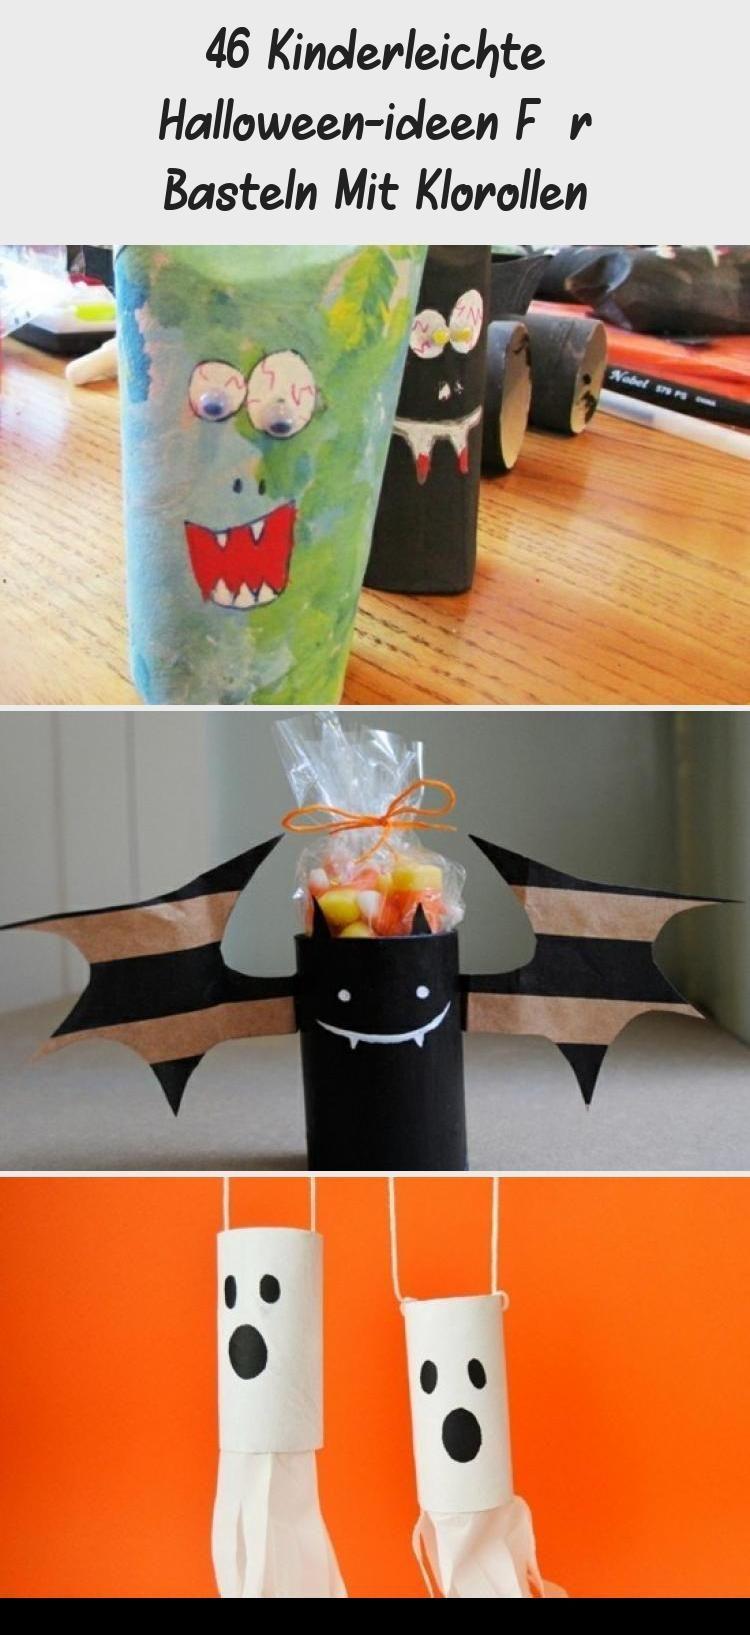 Halloween Basteln Teenager.Halloween Katze Basteln Mit Toilettenpapier Crafts Grundschule Crafts Teenager Bast In 2020 Halloween Katze Basteln Katze Basteln Klorollen Basteln